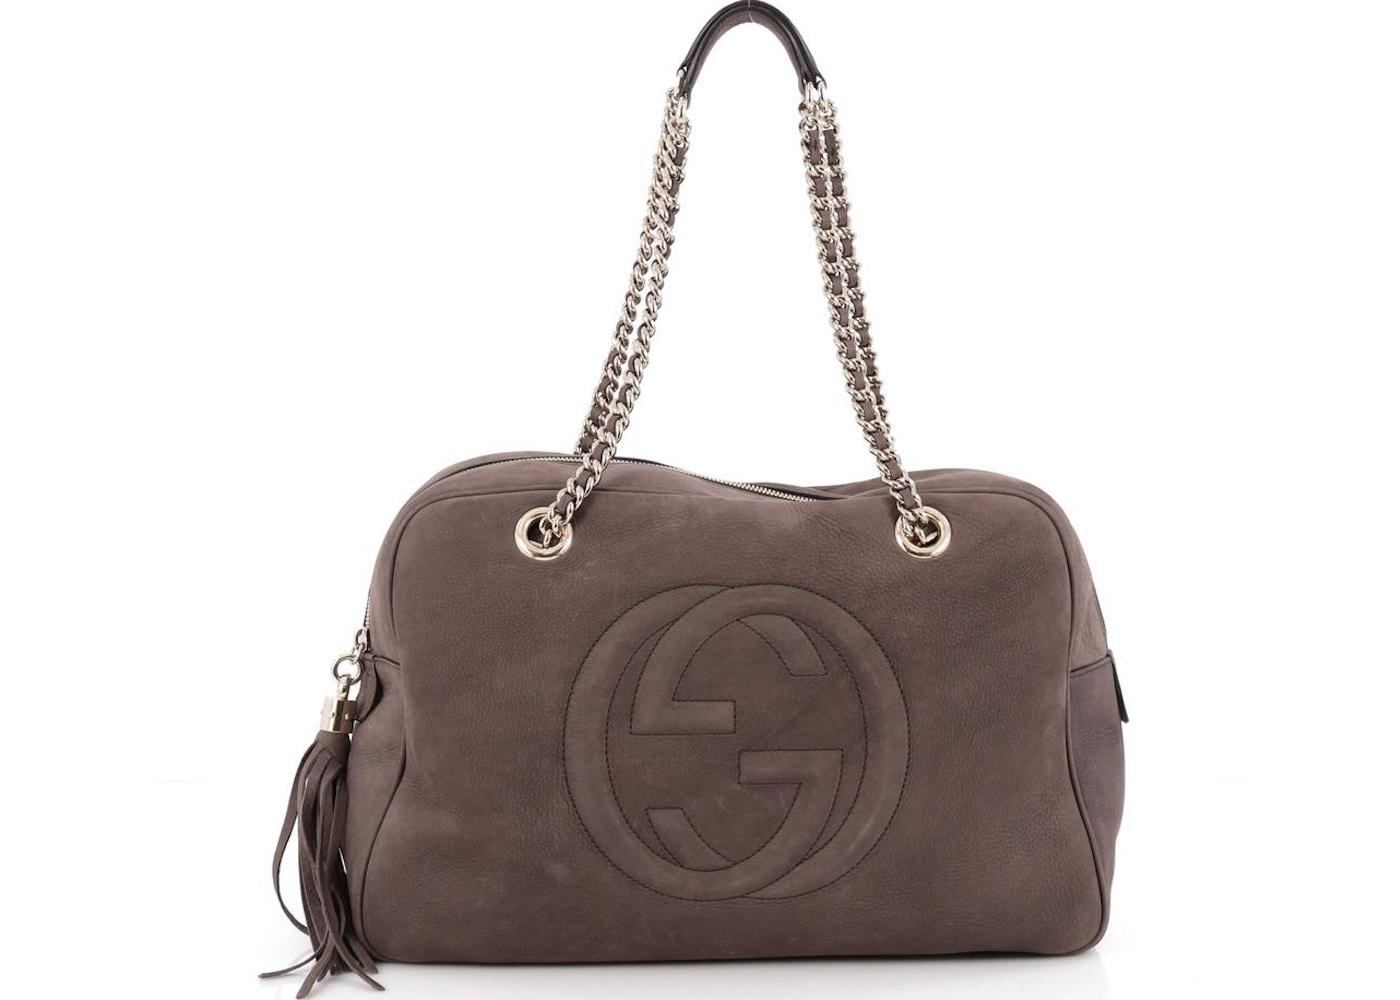 b02ce606e863 Gucci Soho Chain Zipped Shoulder Bag Medium Taupe. Medium Taupe